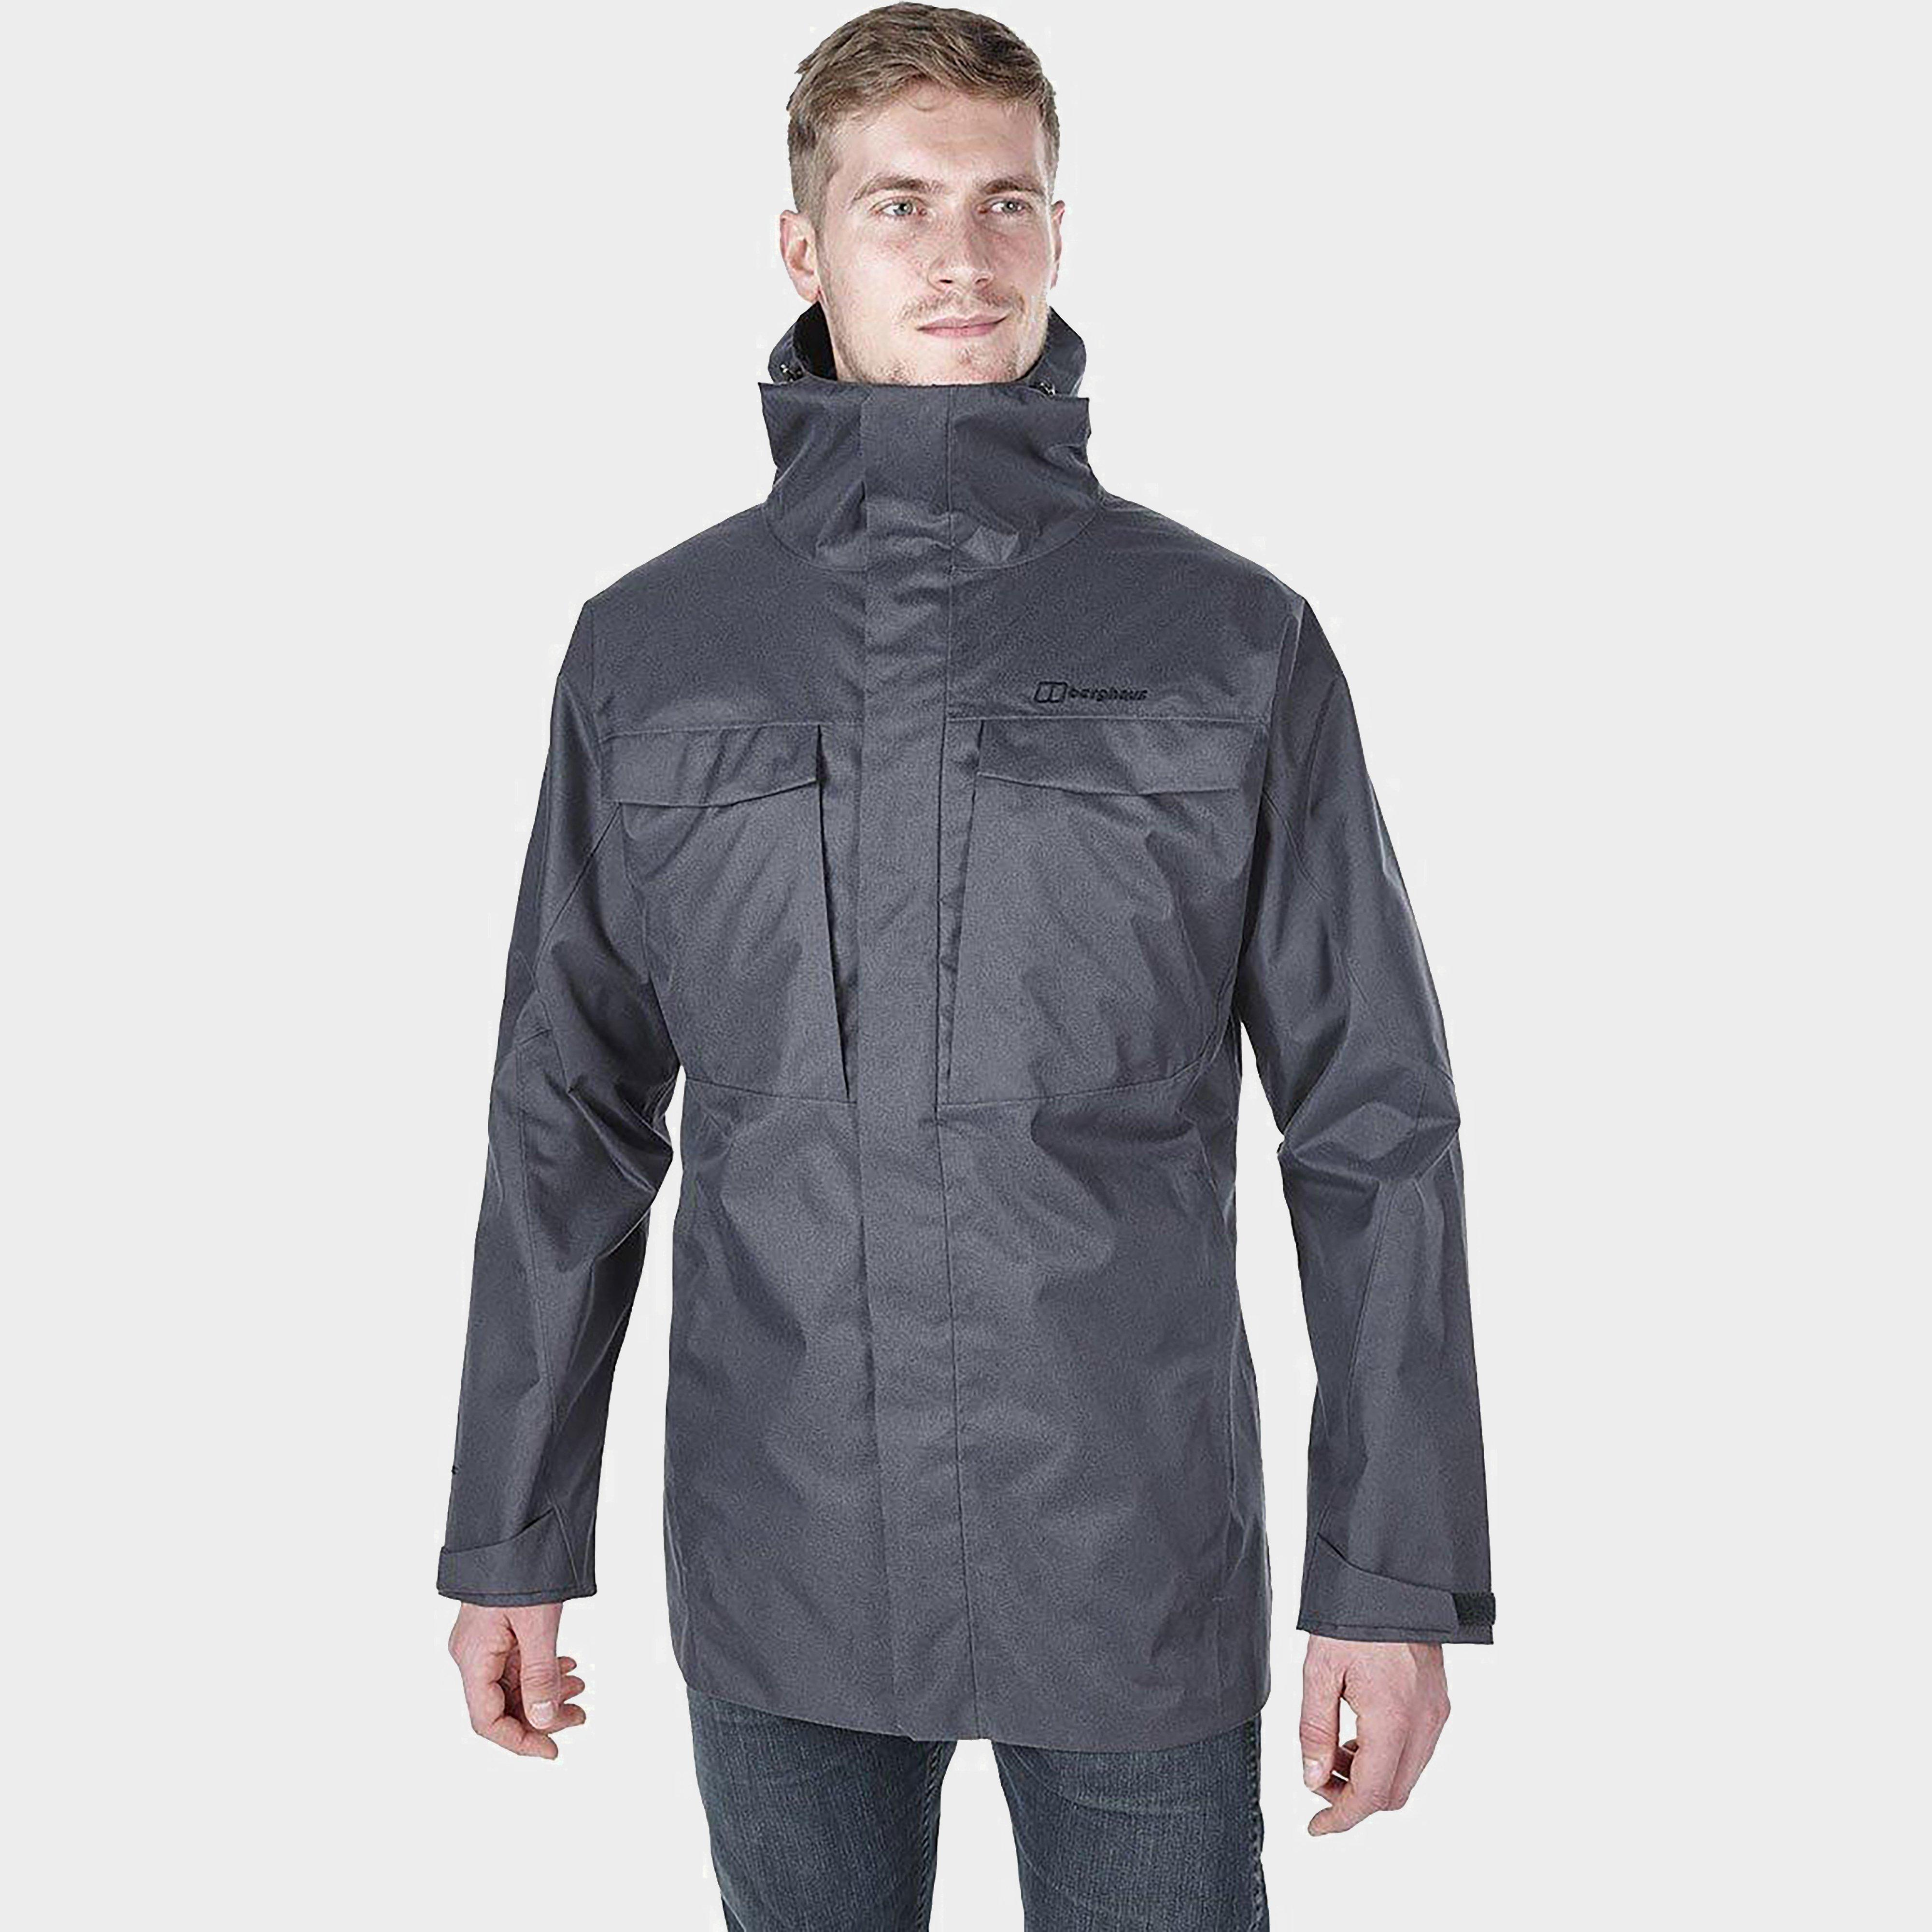 Men's Waterproof Jackets | Men's Gore Tex Jackets | Blacks